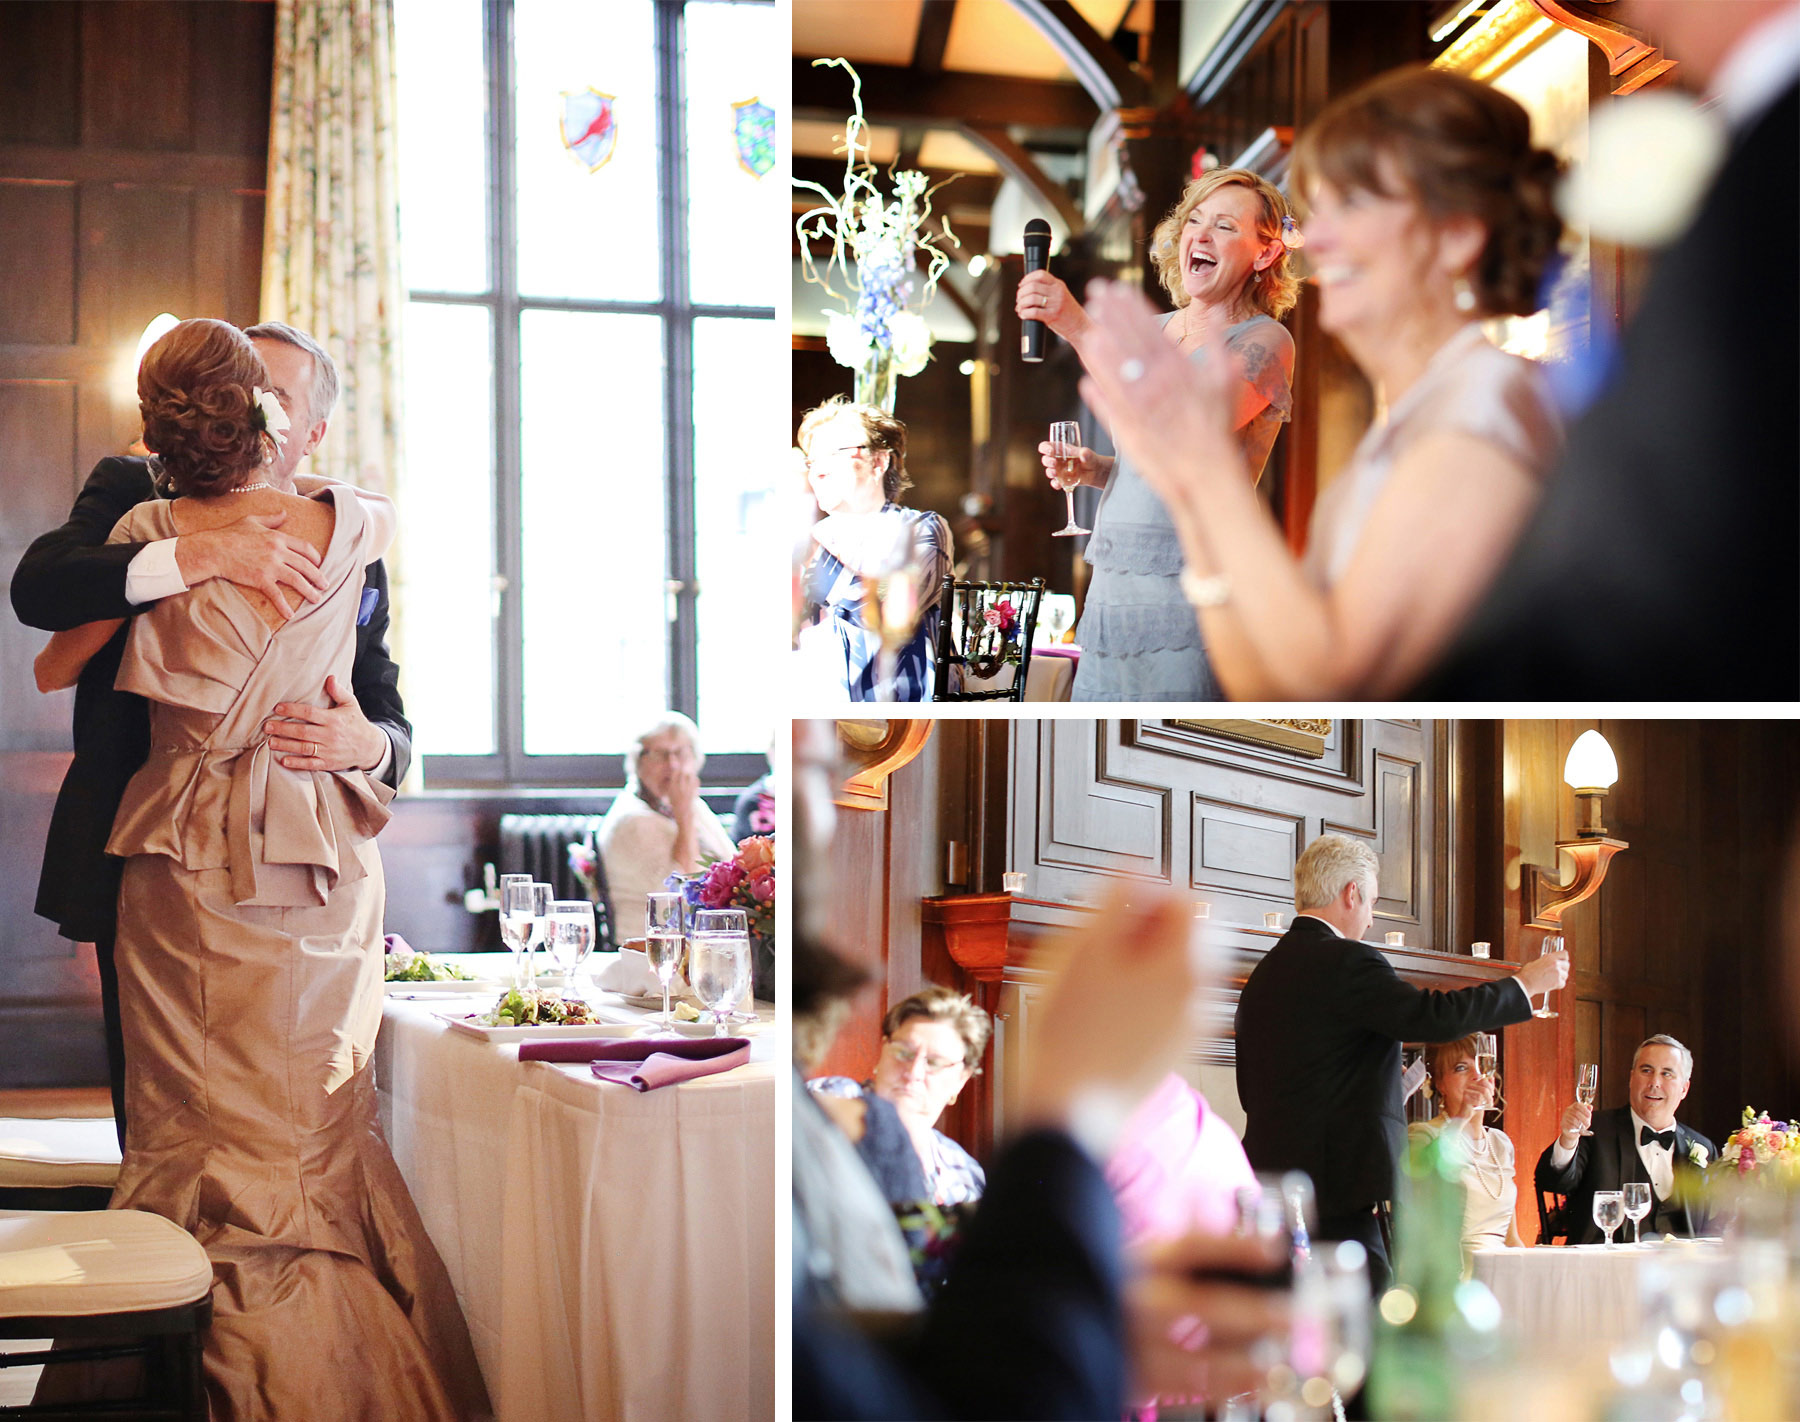 10-Minneapolis-Minnesota-Wedding-Photography-by-Vick-Photography-Downtown-The-Minneapolis-Club-Mansion-Toasting-Tonia-and-Paul.jpg